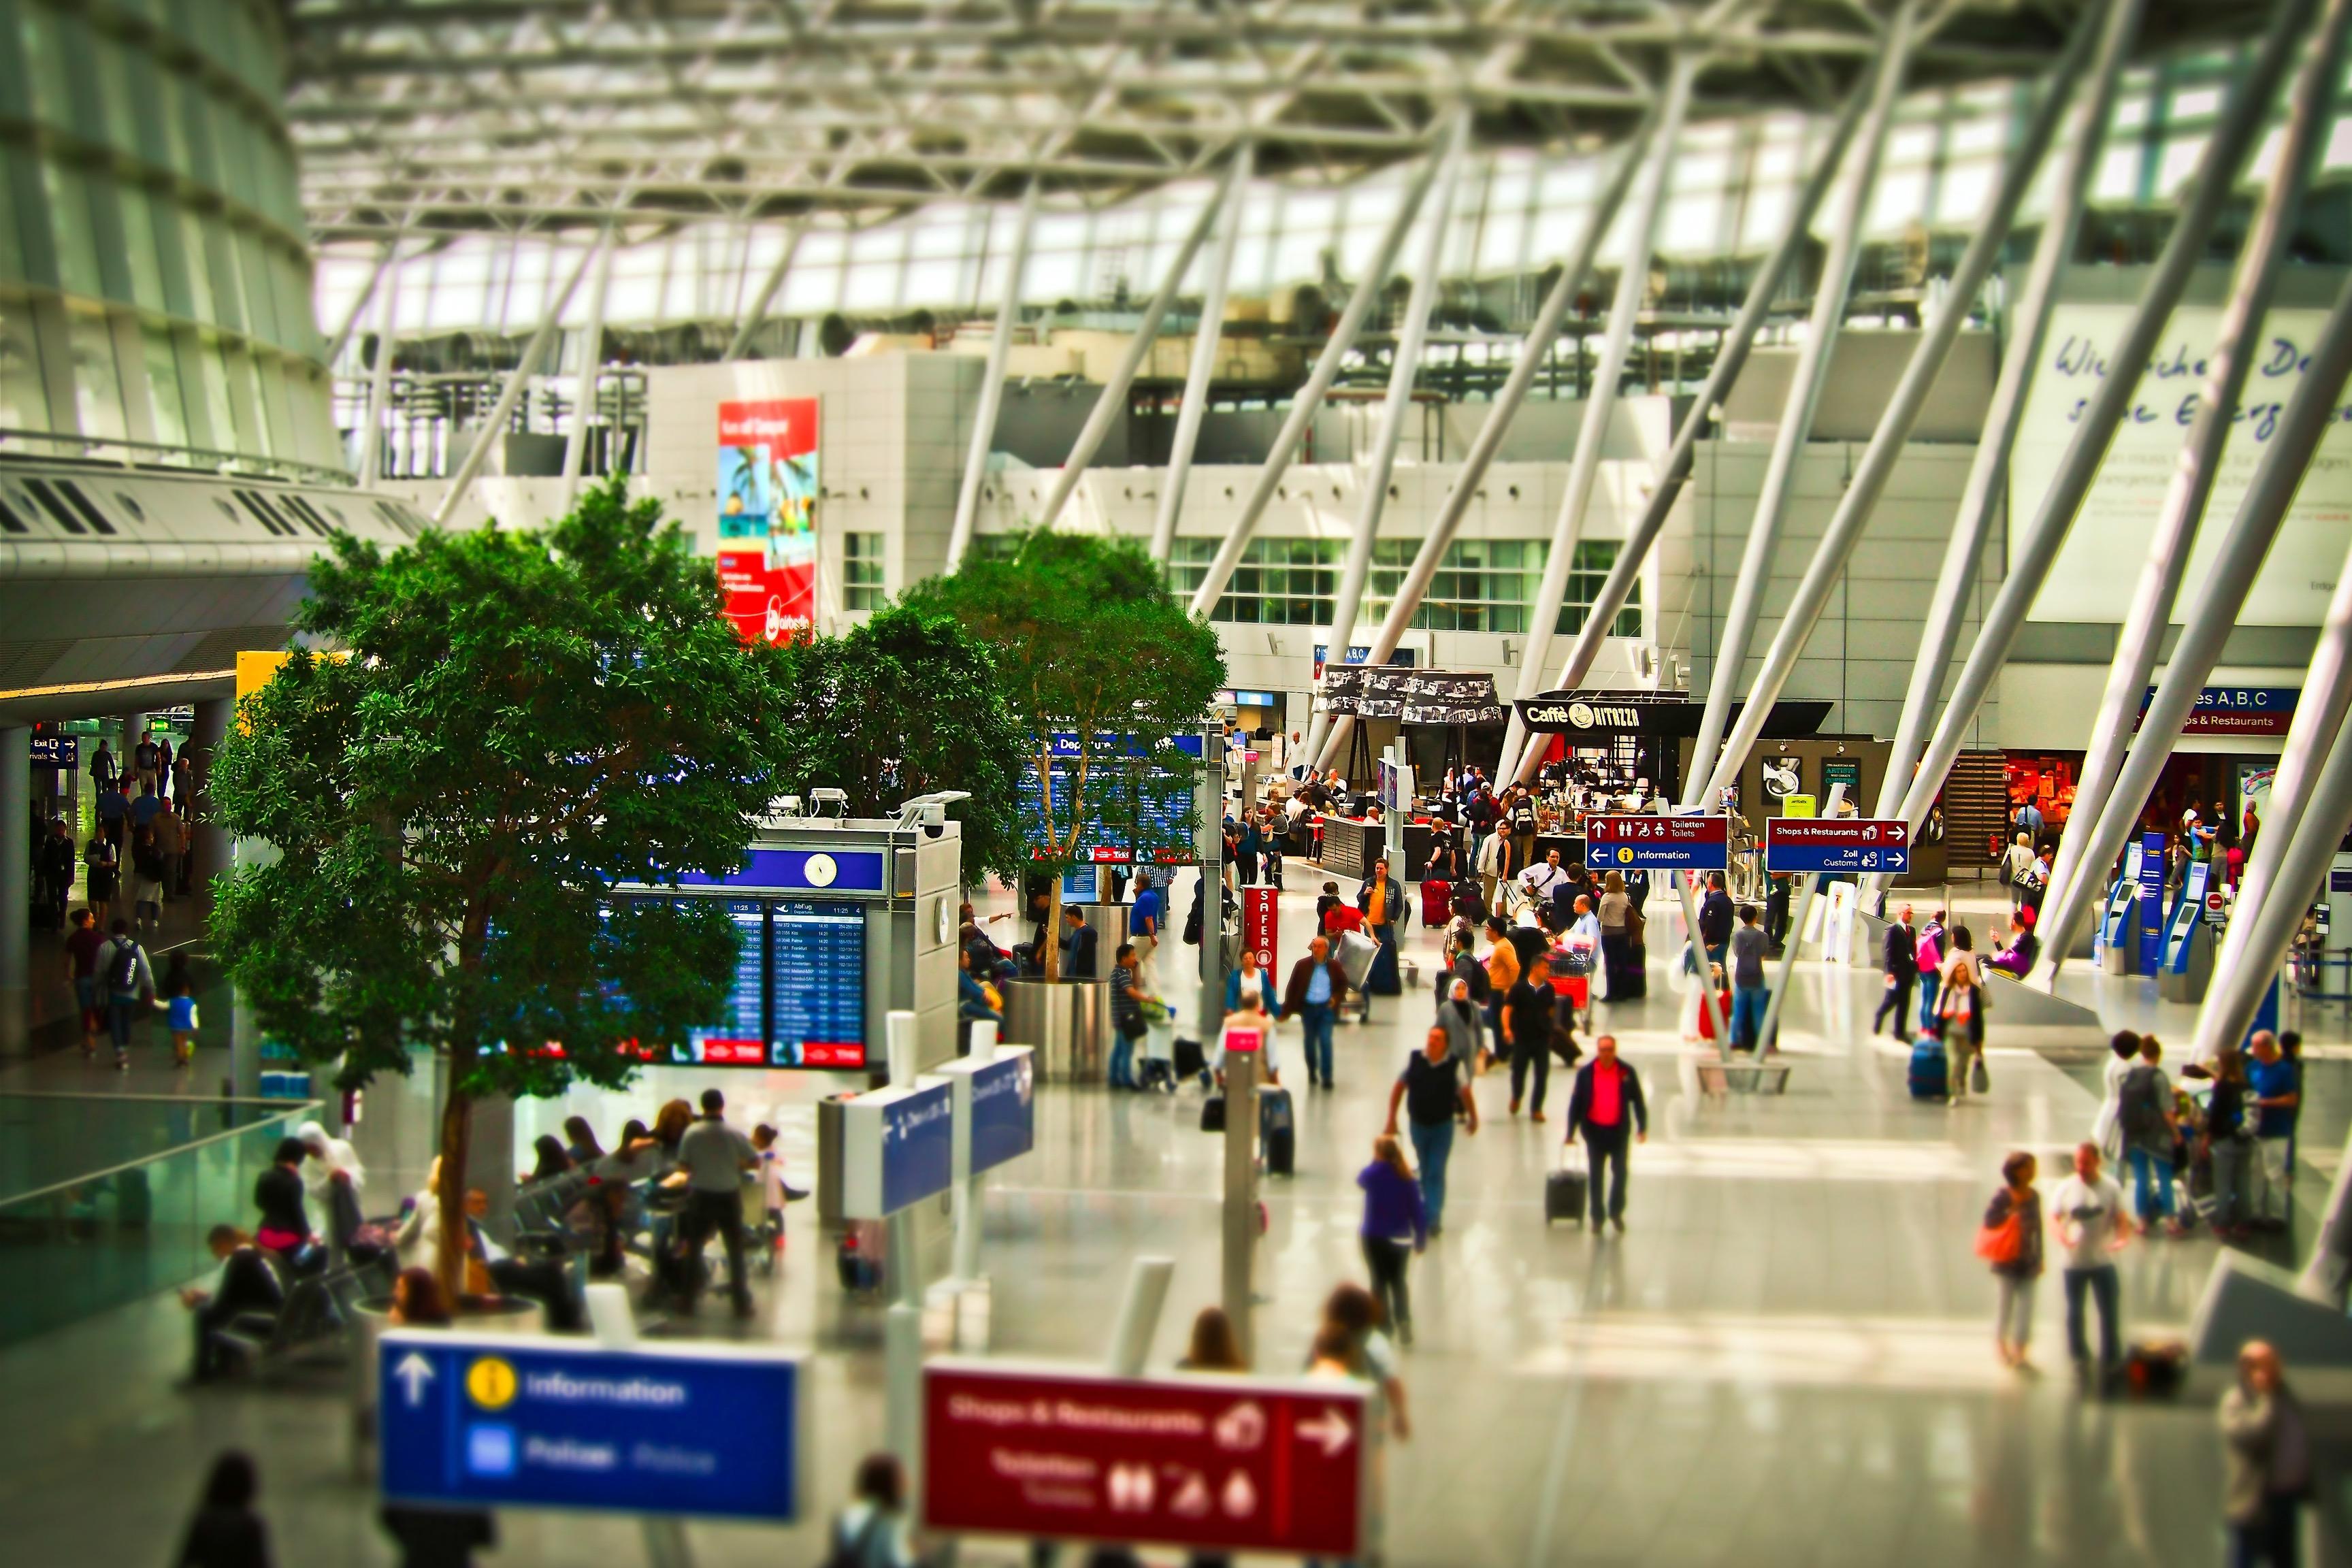 Airport Airside